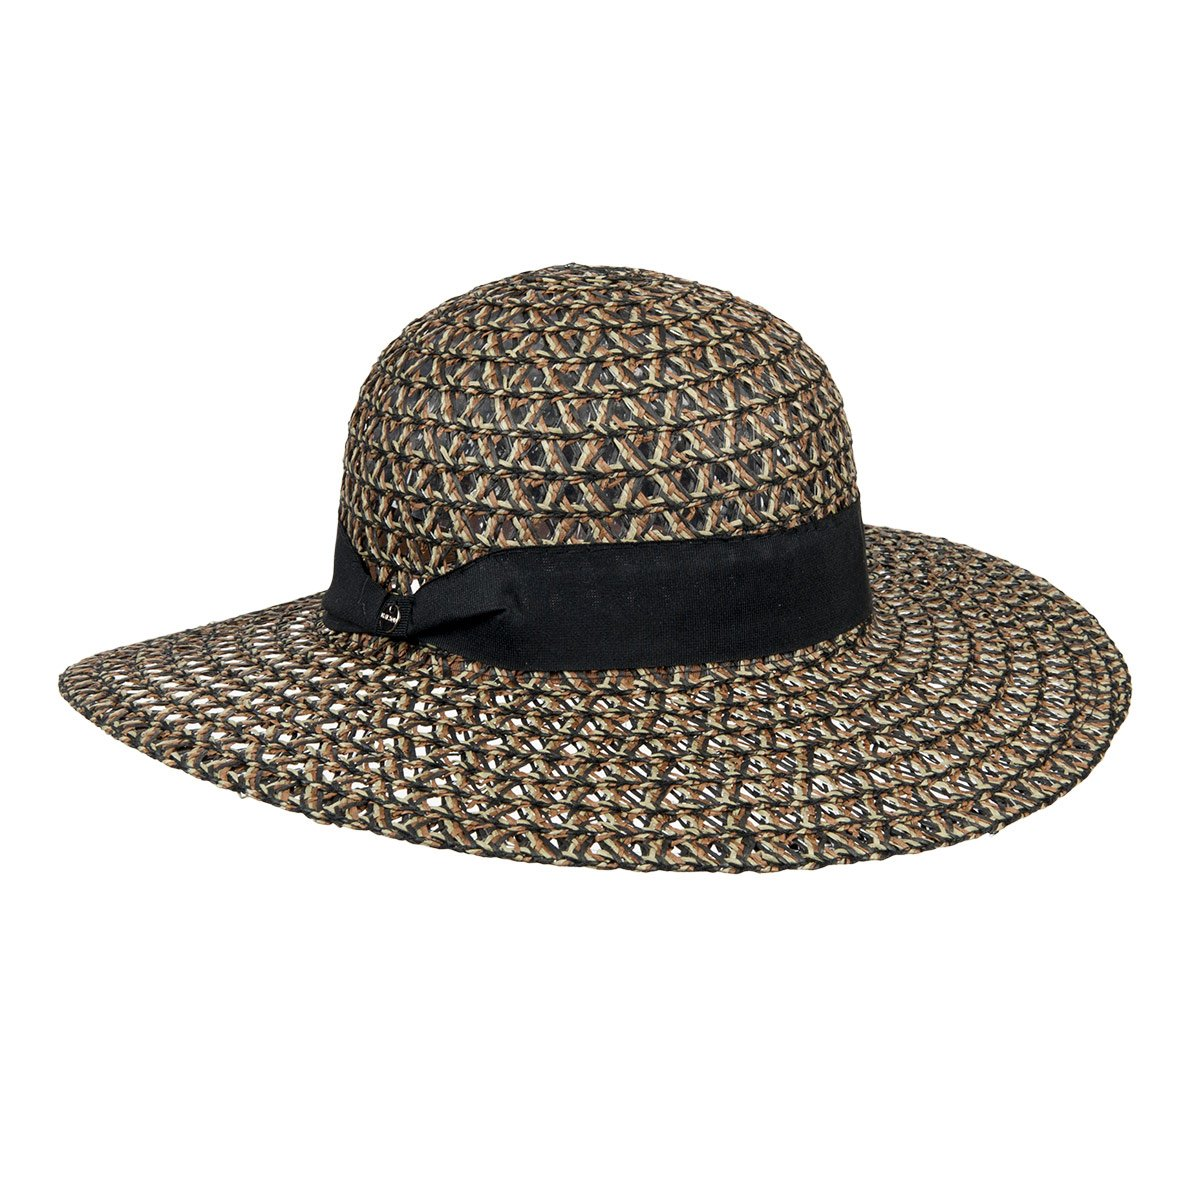 woman s summerhat with wide brim a3525af2c46